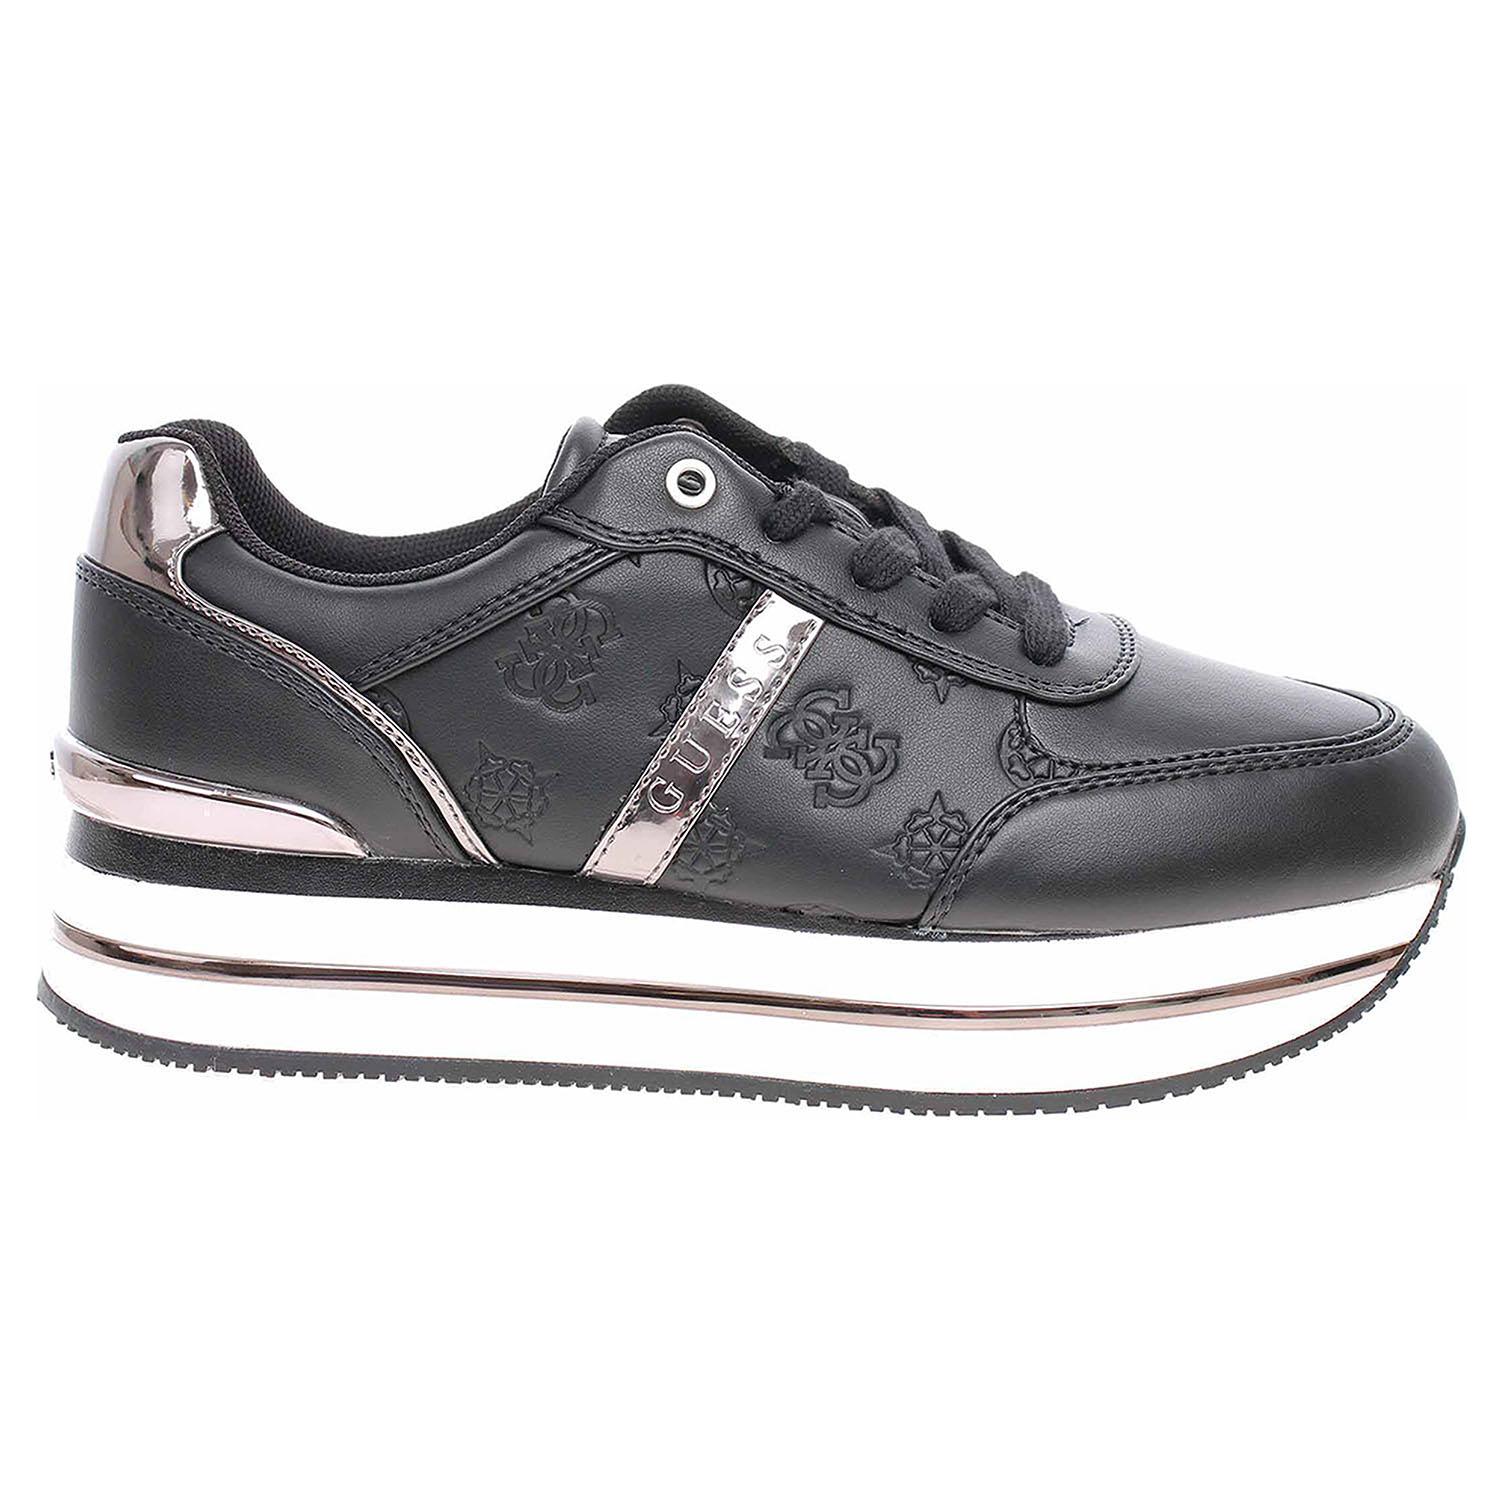 Dámská obuv Guess Dafnee black FL7DFEFAL12 black 36